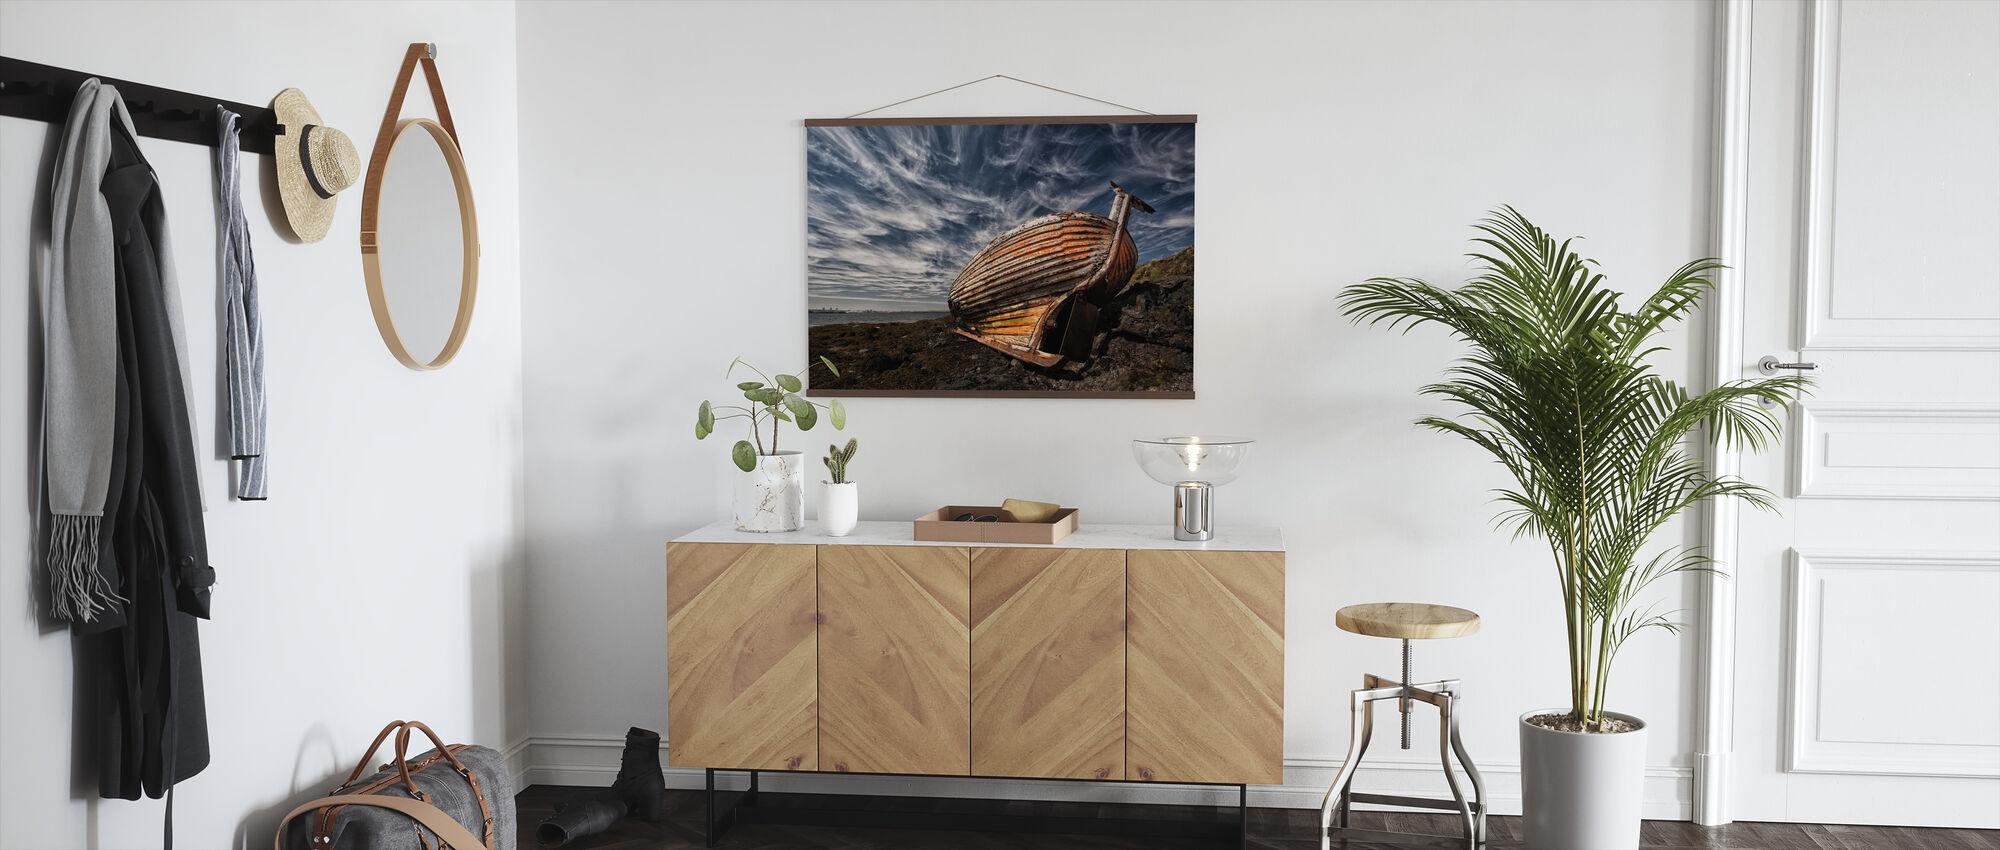 Stern Boat - Poster - Hallway